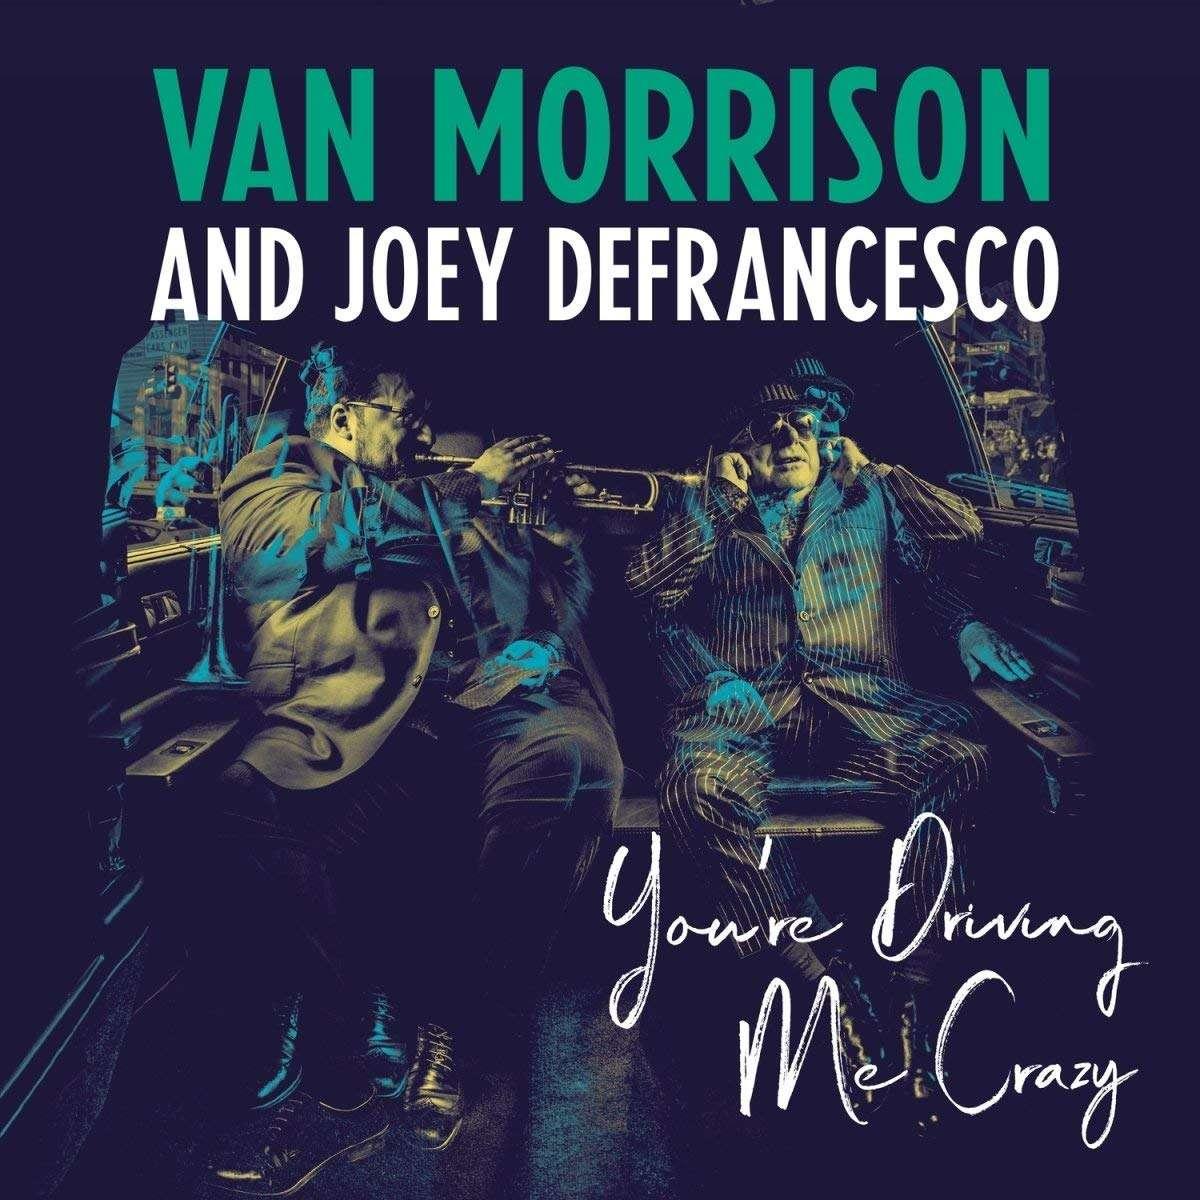 Van Morrison & Joey Defrancesco - You're Driving Me Crazy LP - Van Morrison